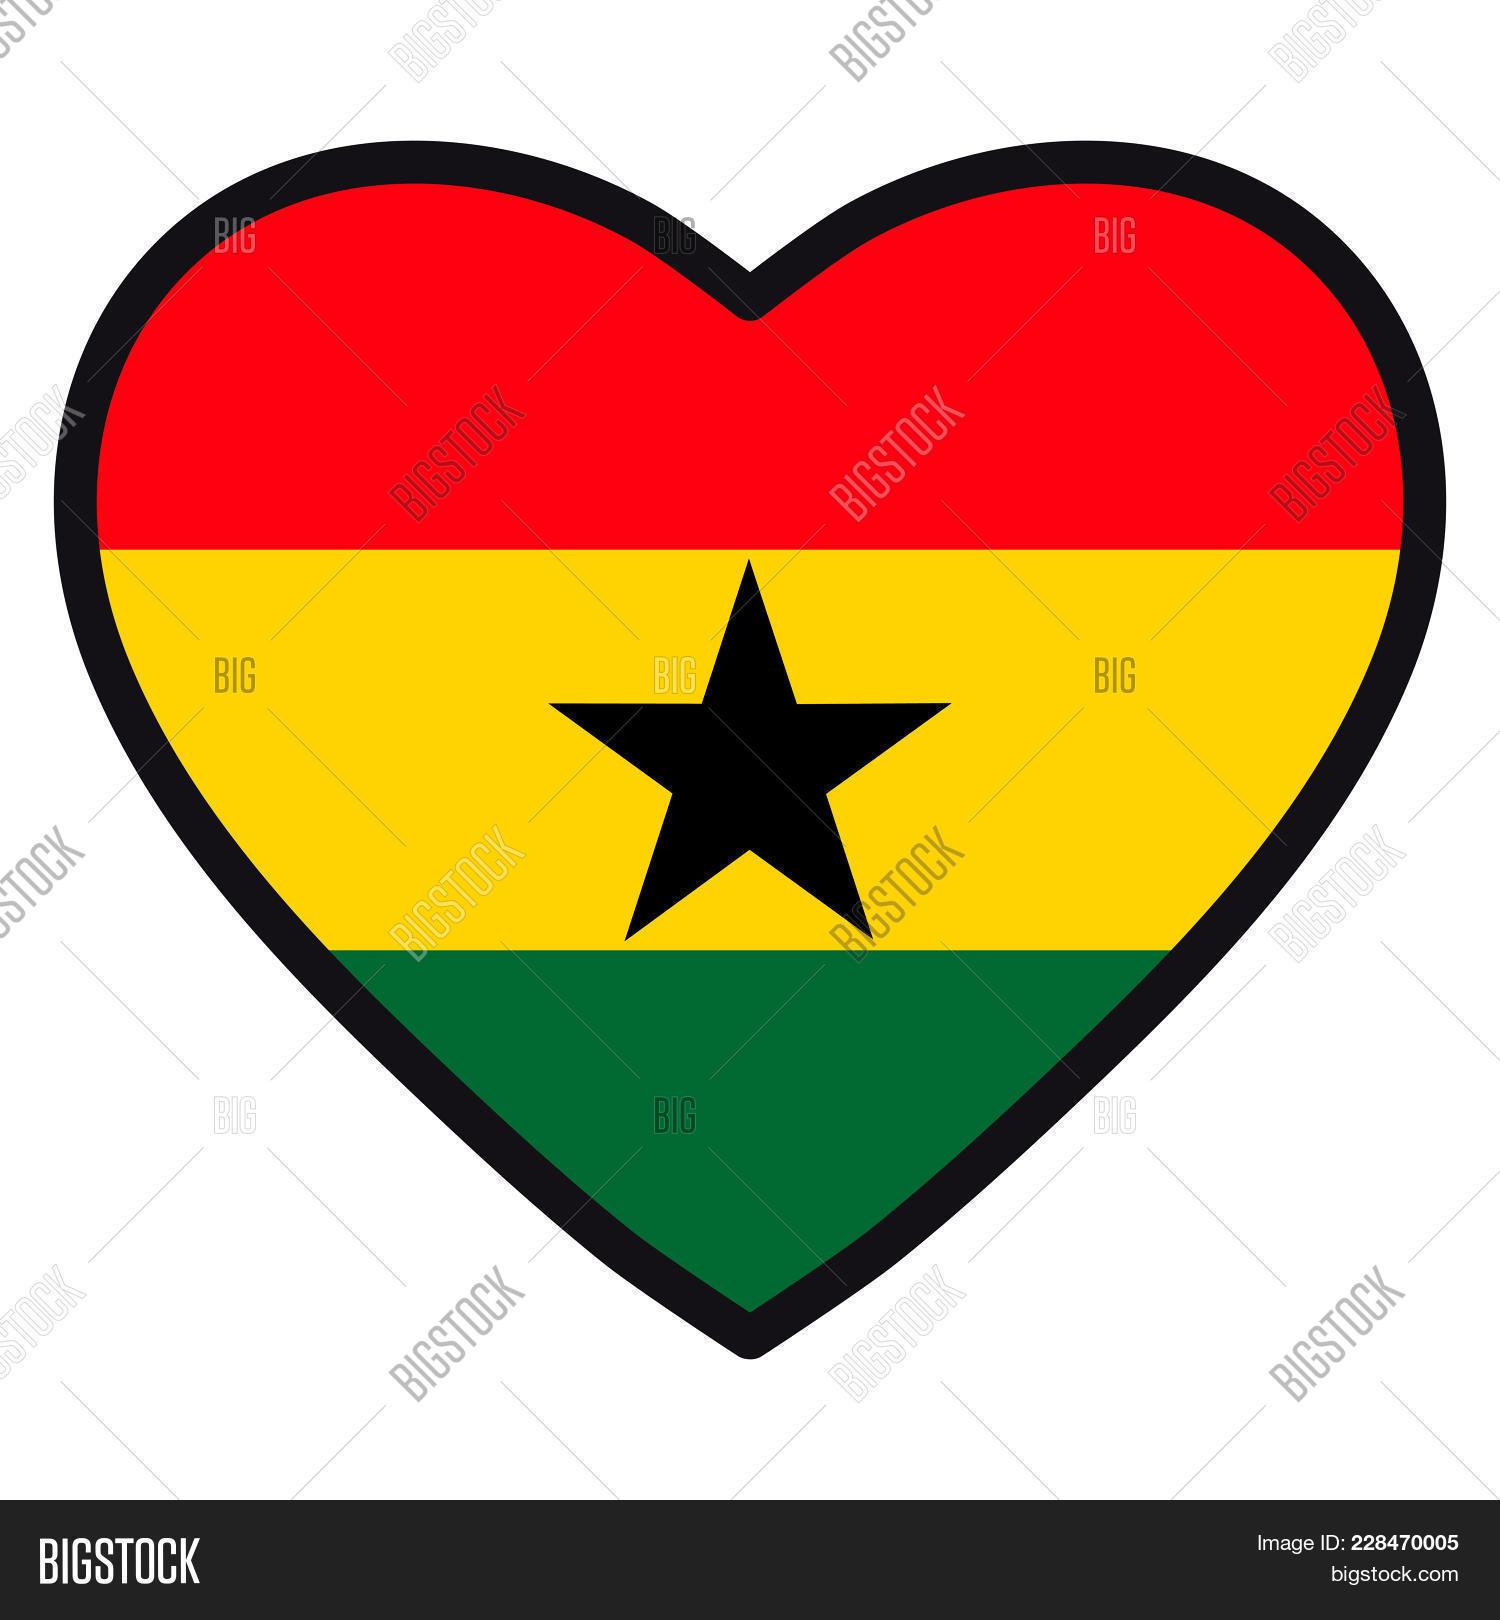 Flag Ghana Shape Heart Image & Photo (Free Trial)   Bigstock